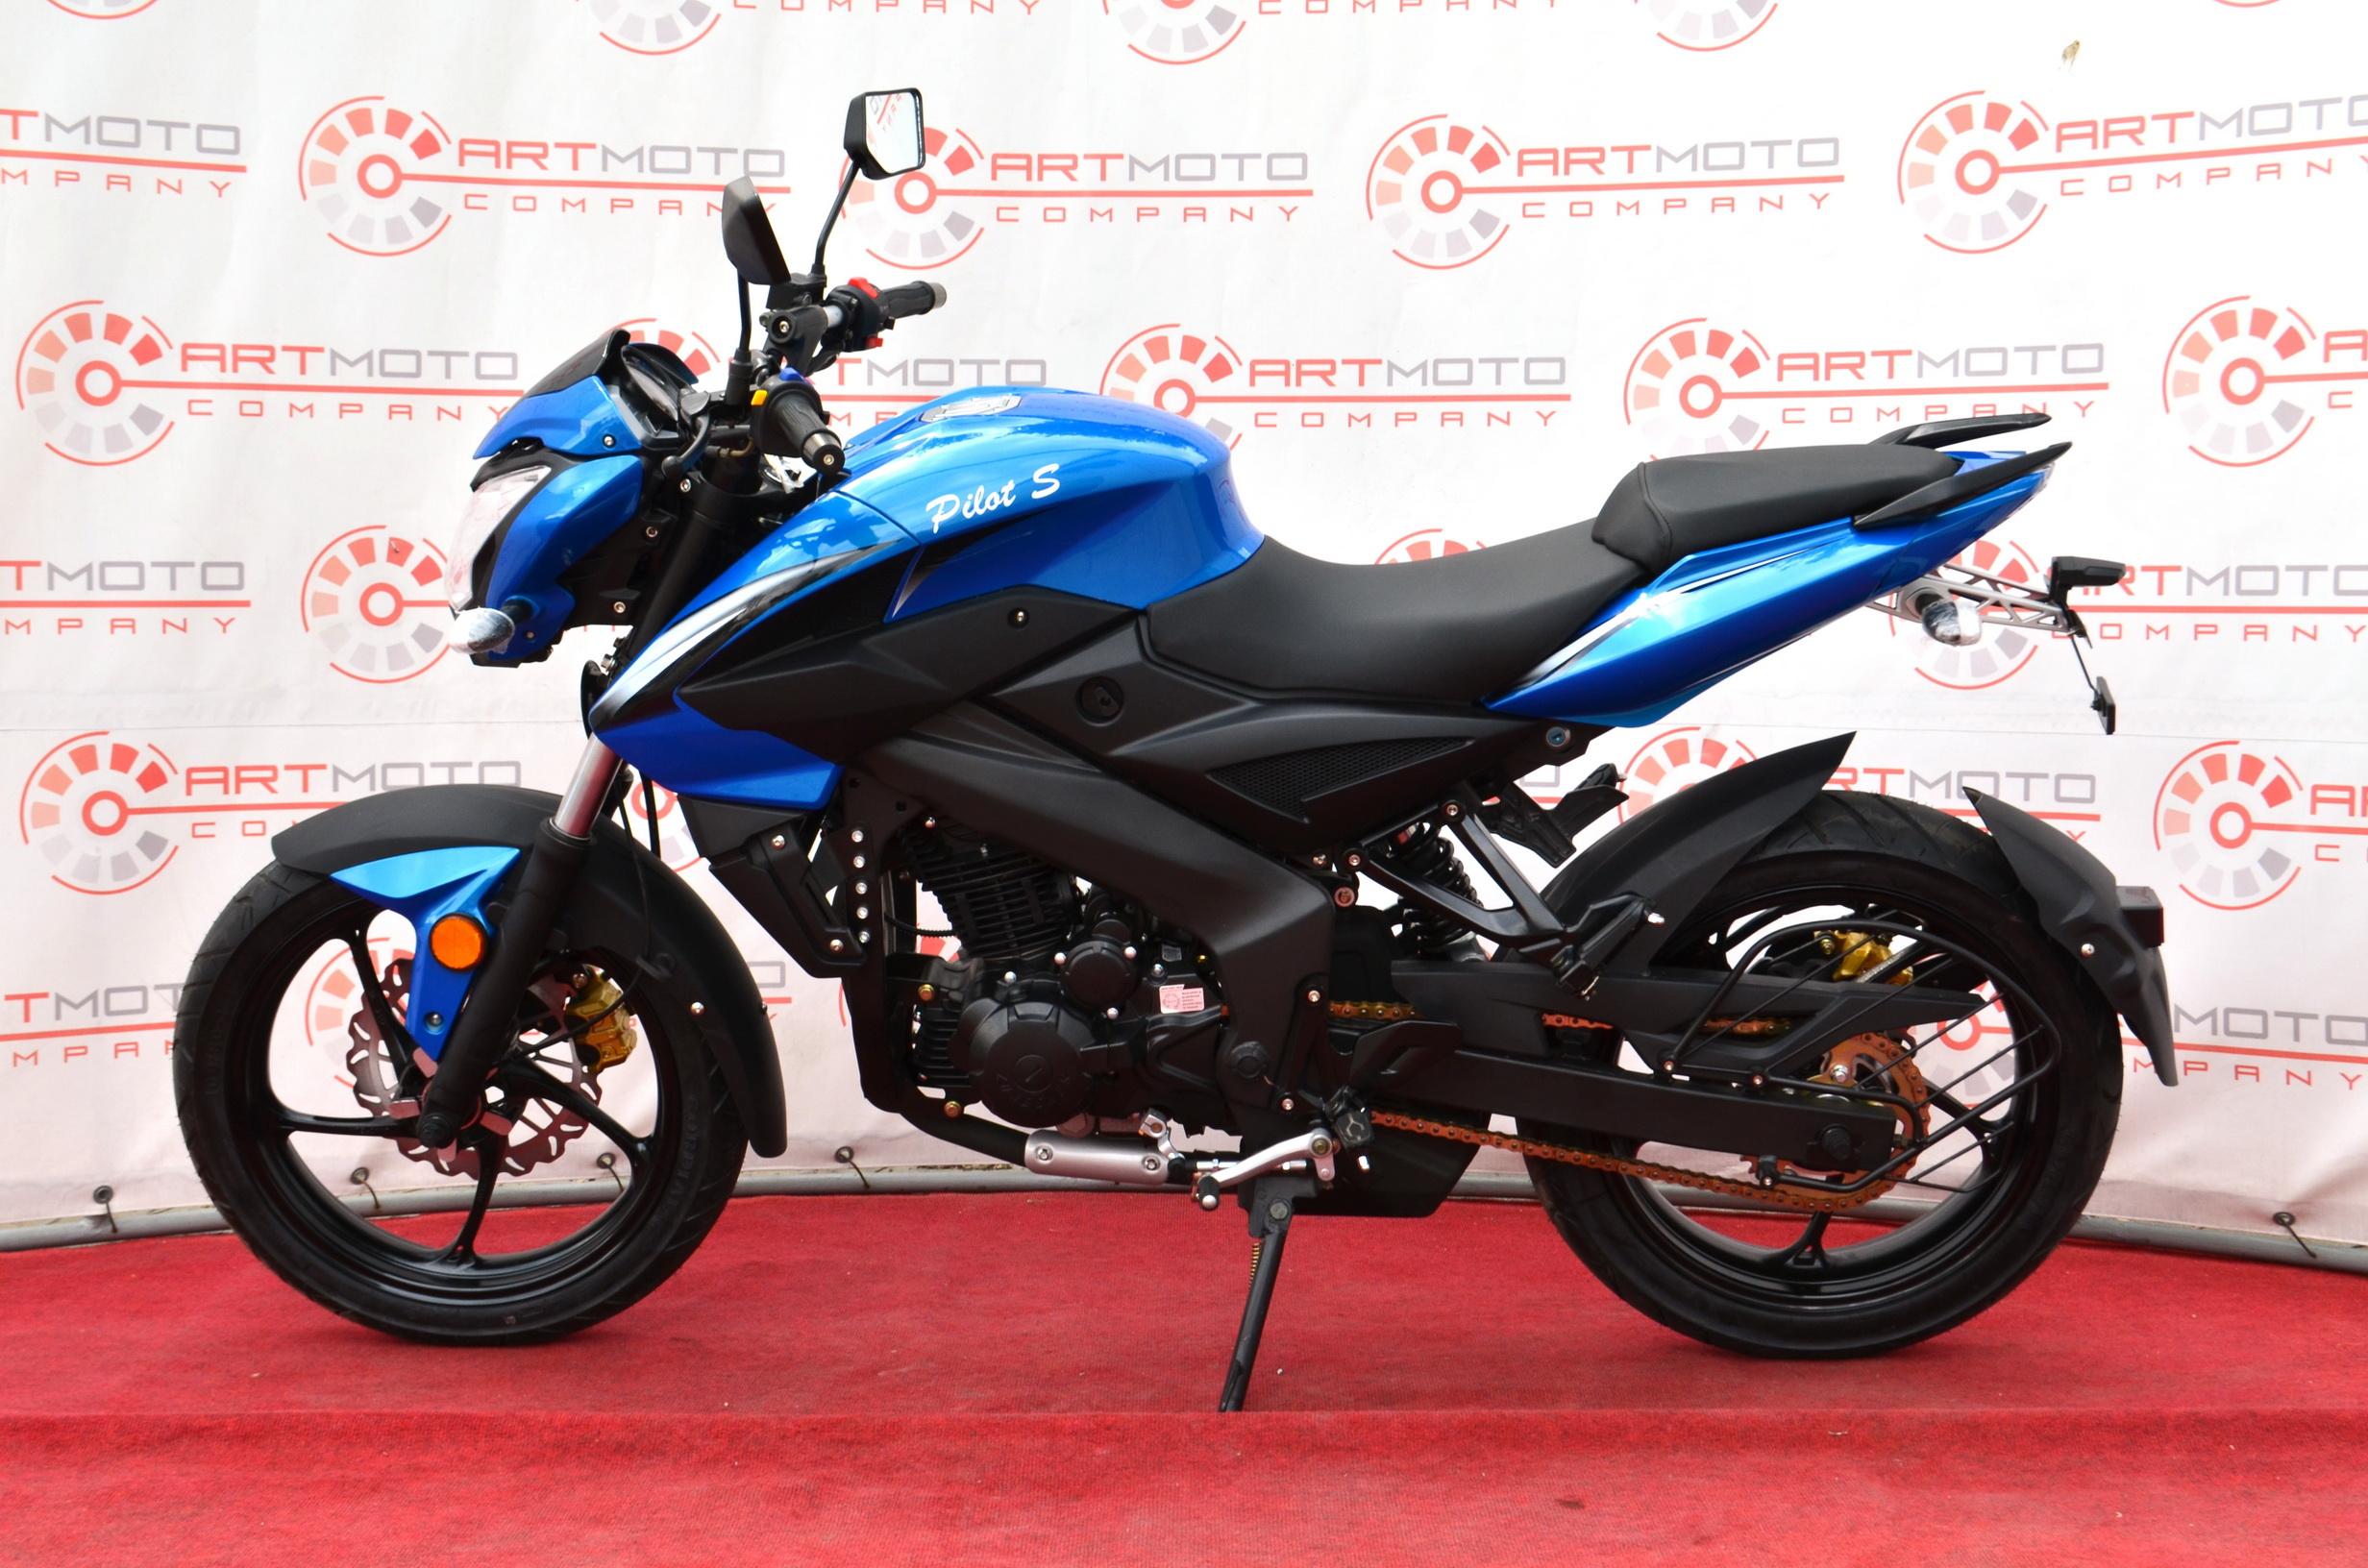 МОТОЦИКЛ BASHAN PILOT S 250 Blue ― Артмото - купить квадроцикл в украине и харькове, мотоцикл, снегоход, скутер, мопед, электромобиль